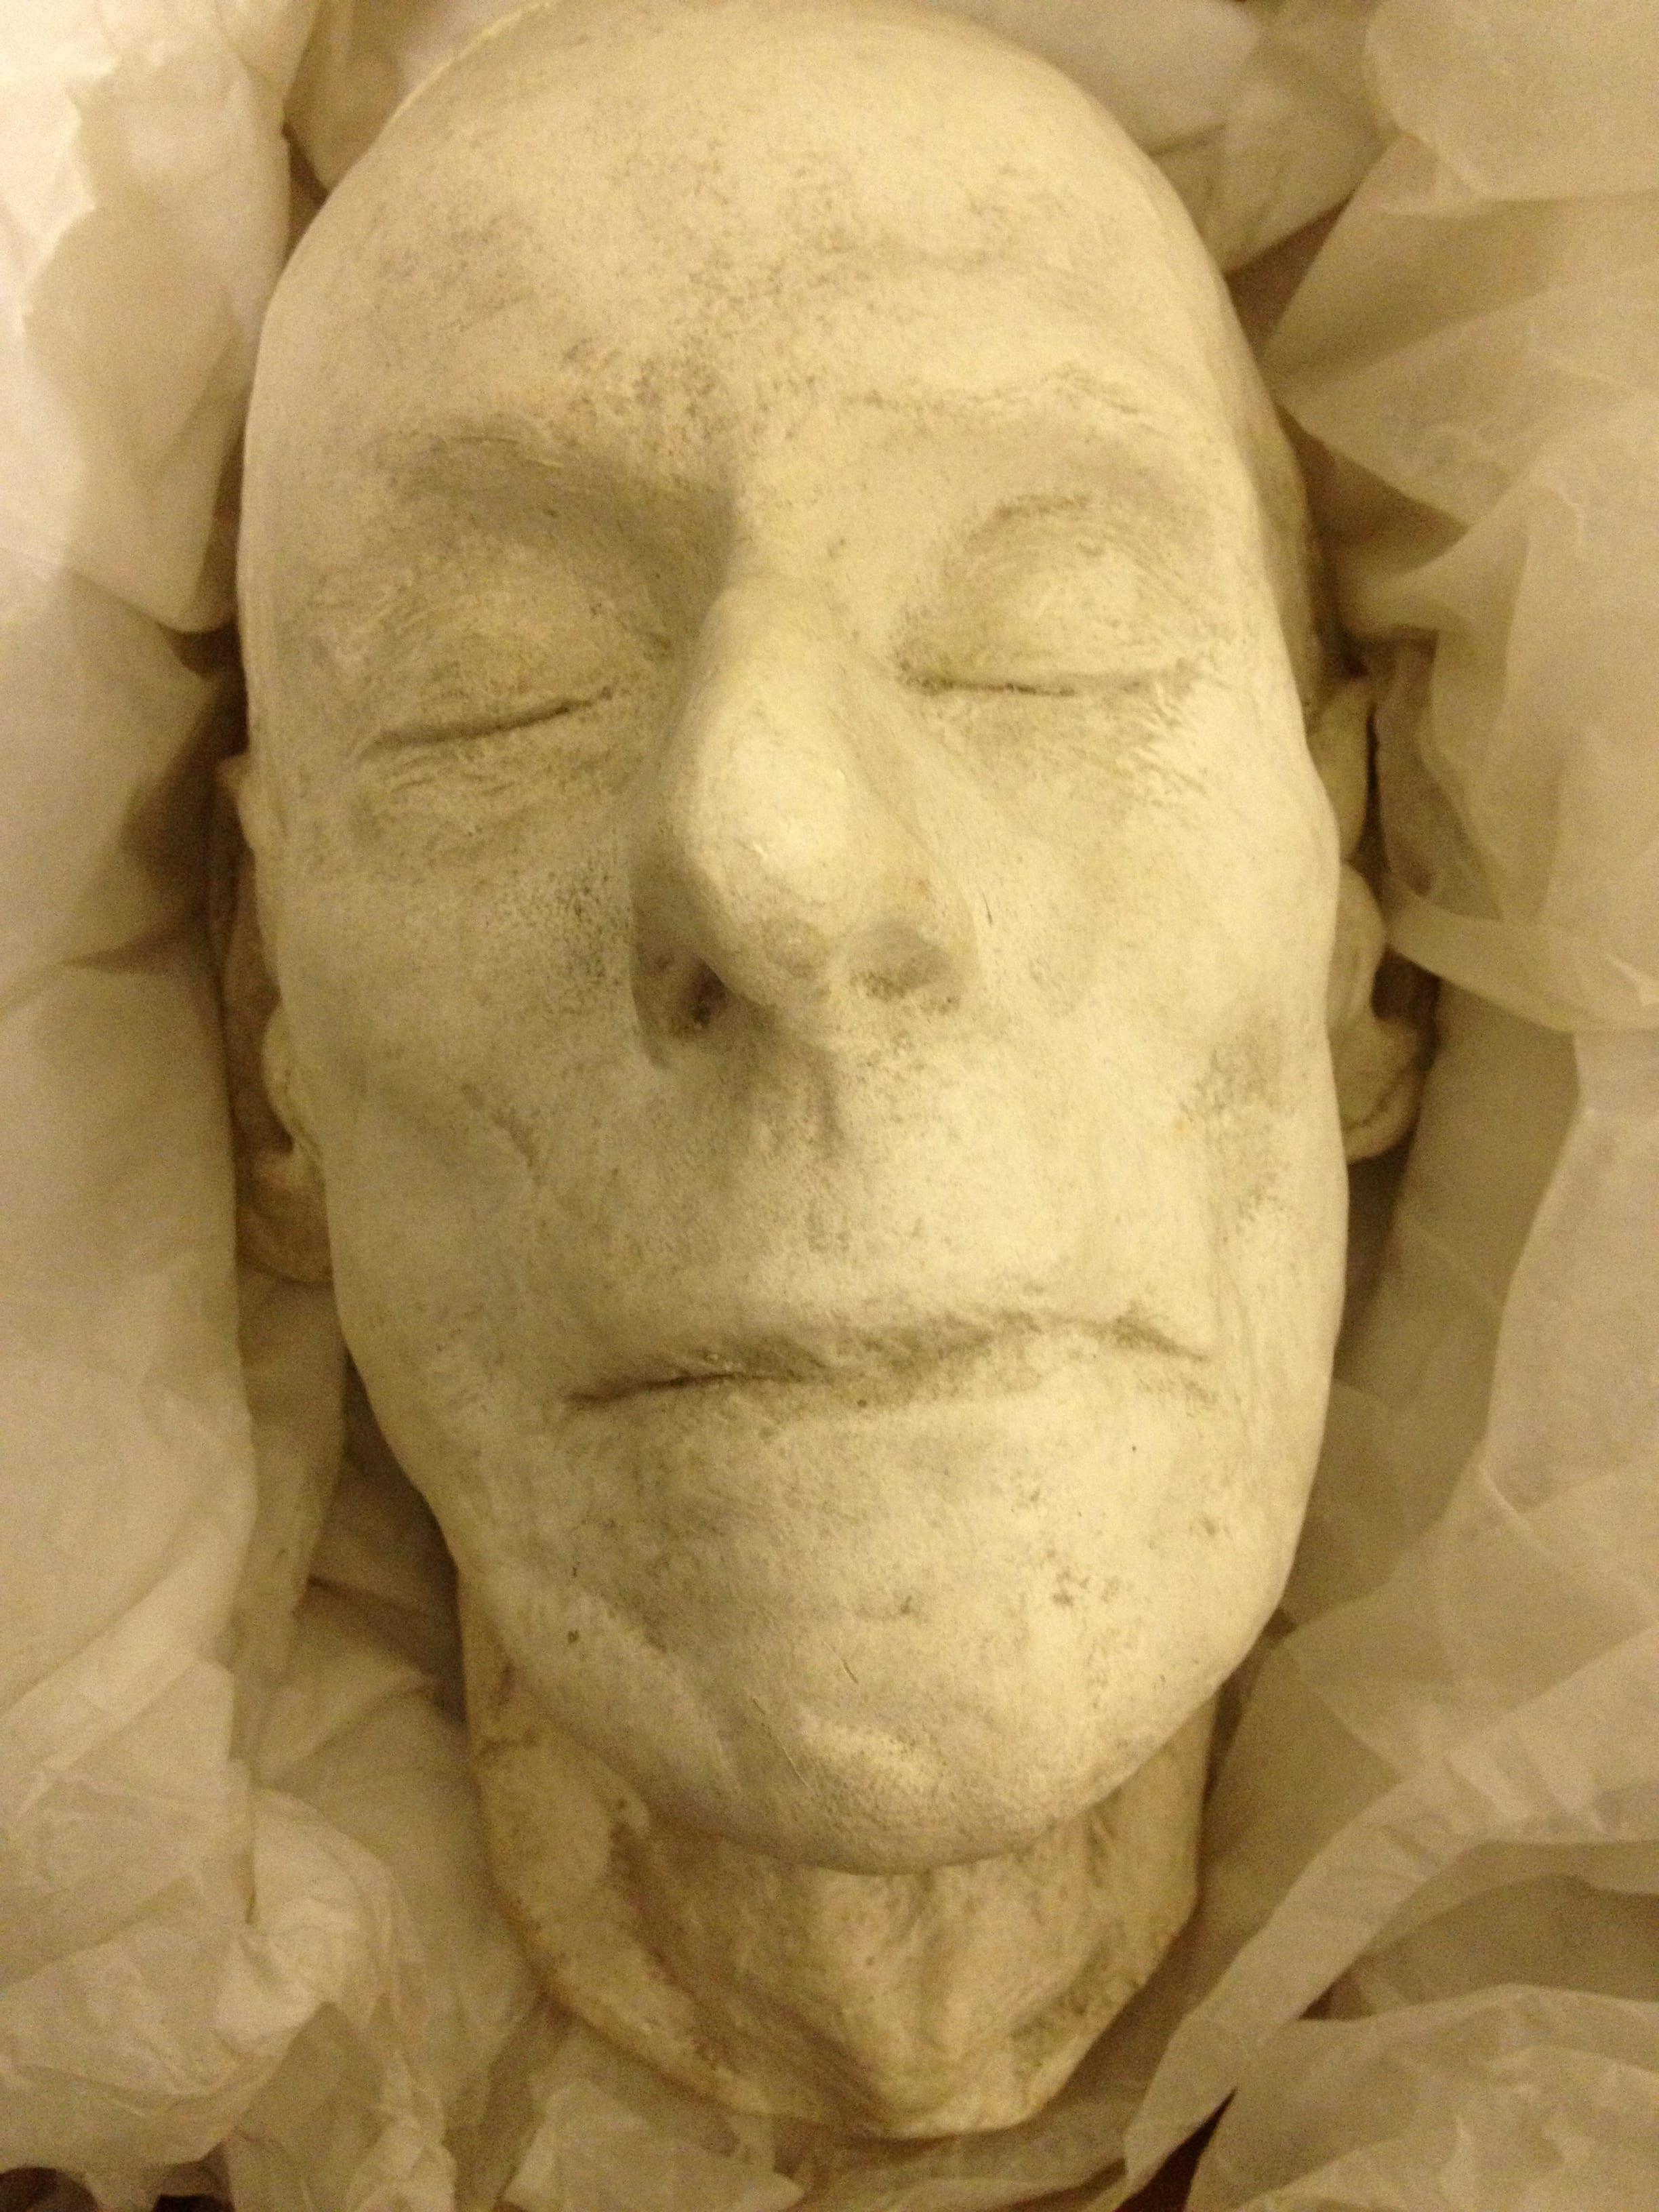 Tonks death mask